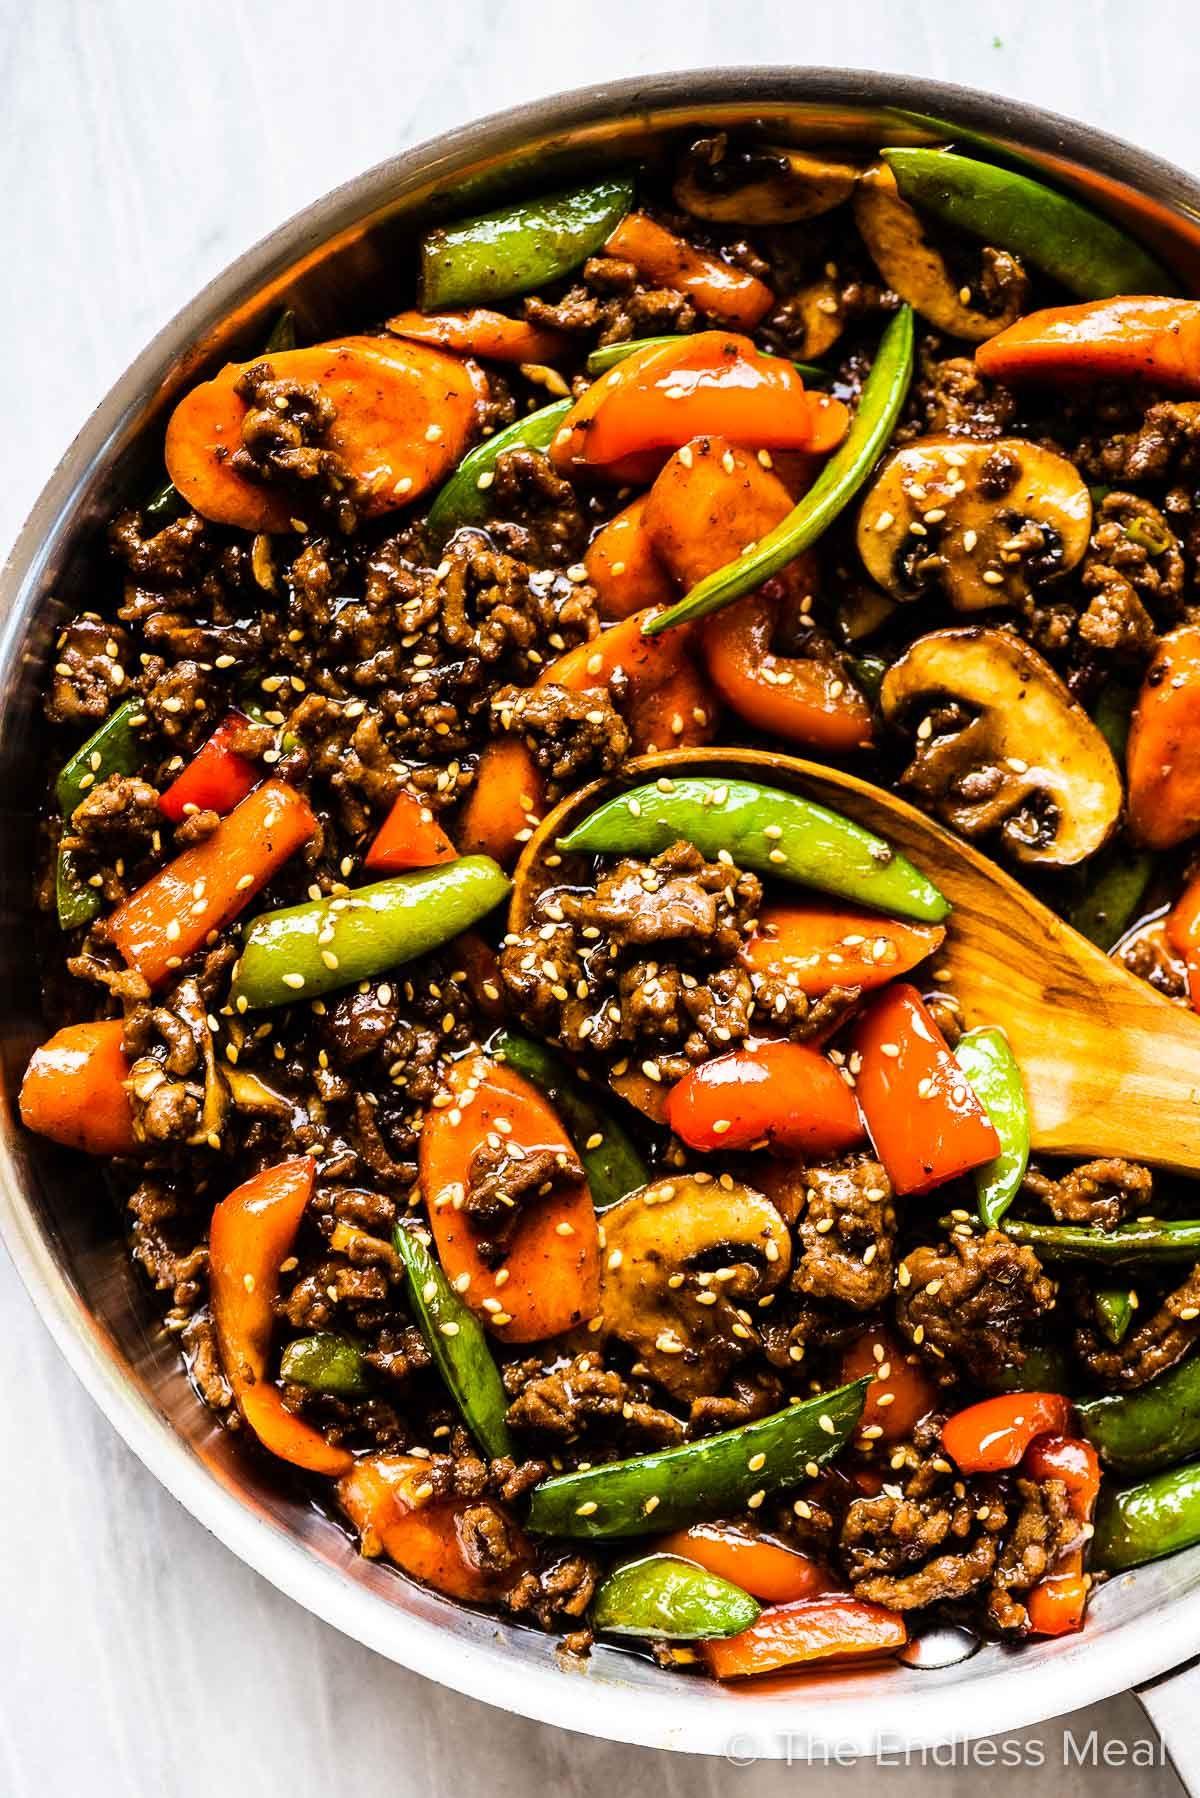 Ground Beef Stir Fry With Garlic Ginger Sauce Recipe In 2020 Beef Stir Fry Good Healthy Recipes Ground Beef